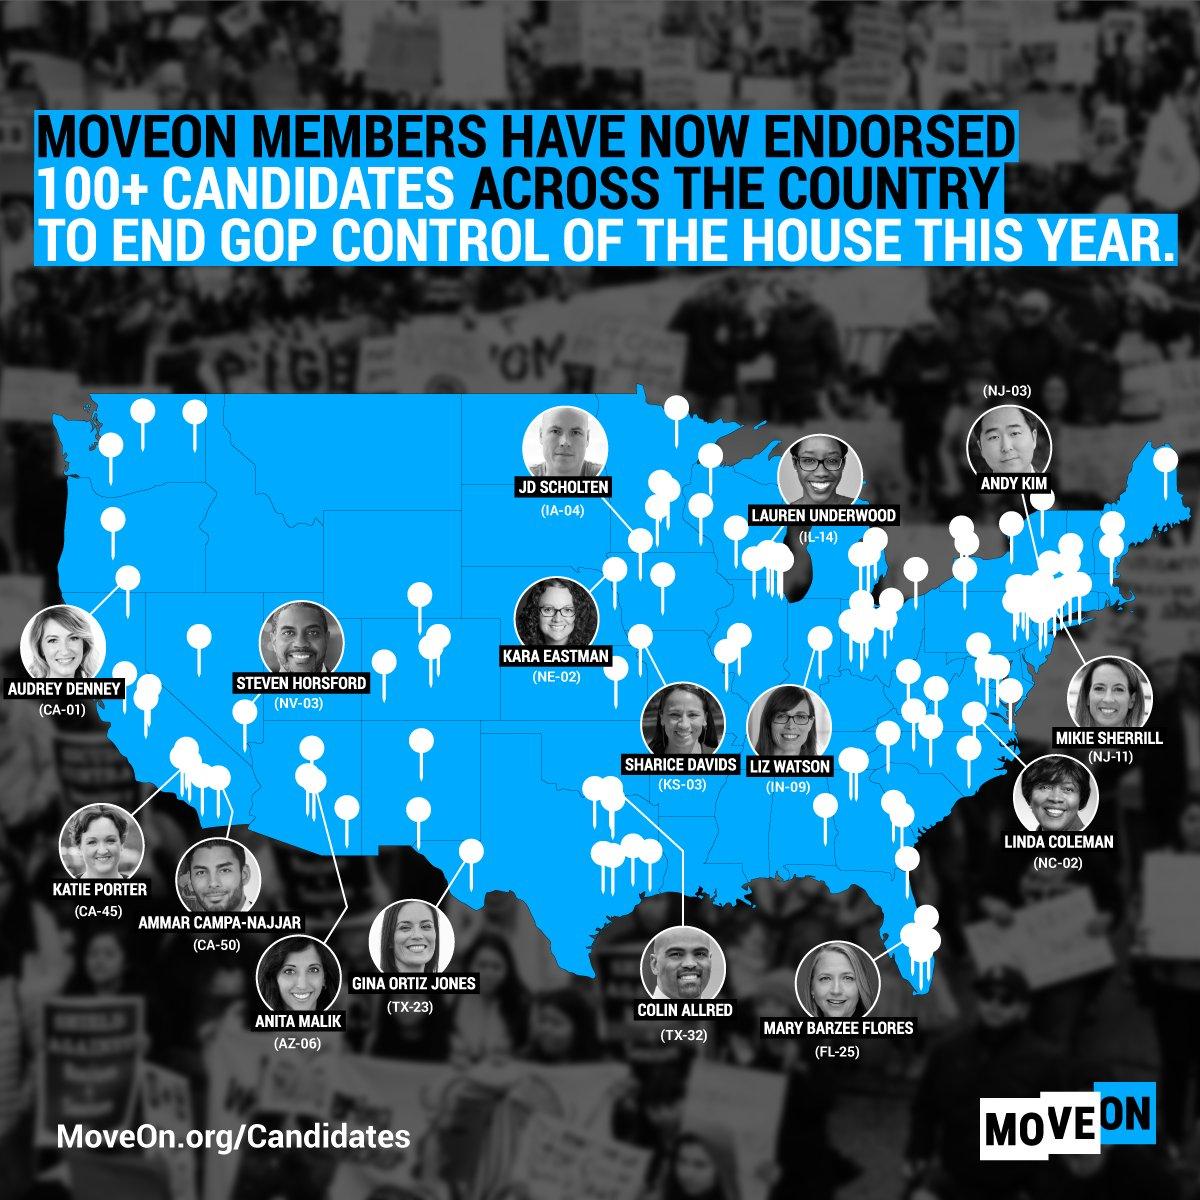 .@HouseGOP - were coming for your seats. 🌊 @GinaOrtizJones, @ColinAllredTX, @MBFforCongress, @katieporteroc, @audrey4congress & more! Learn more about the #ResistAndWin program: moveon.org/resistandwin